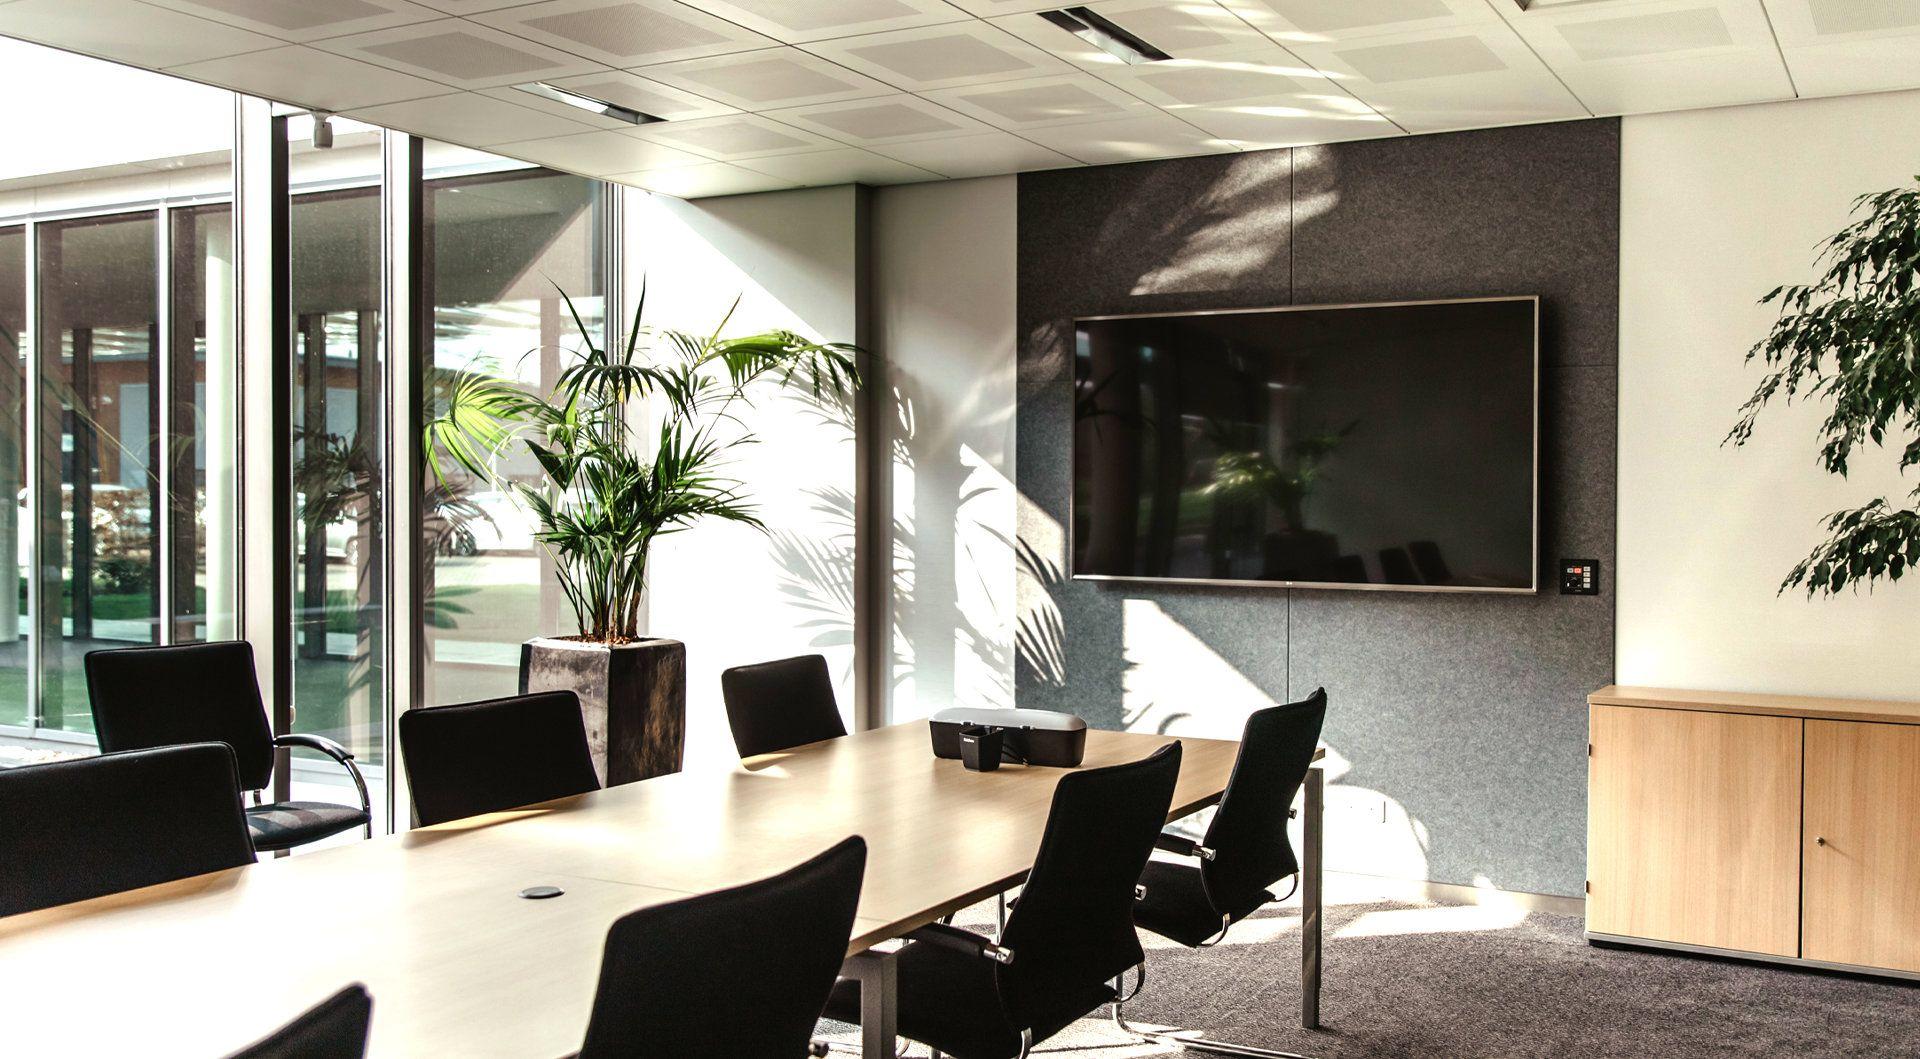 Sony VPL-FHZ101 beamer/projector Desktopprojector 10000 ANSI lumens 3LCD WUXGA (1920x1200) Wit - Case studie de vries